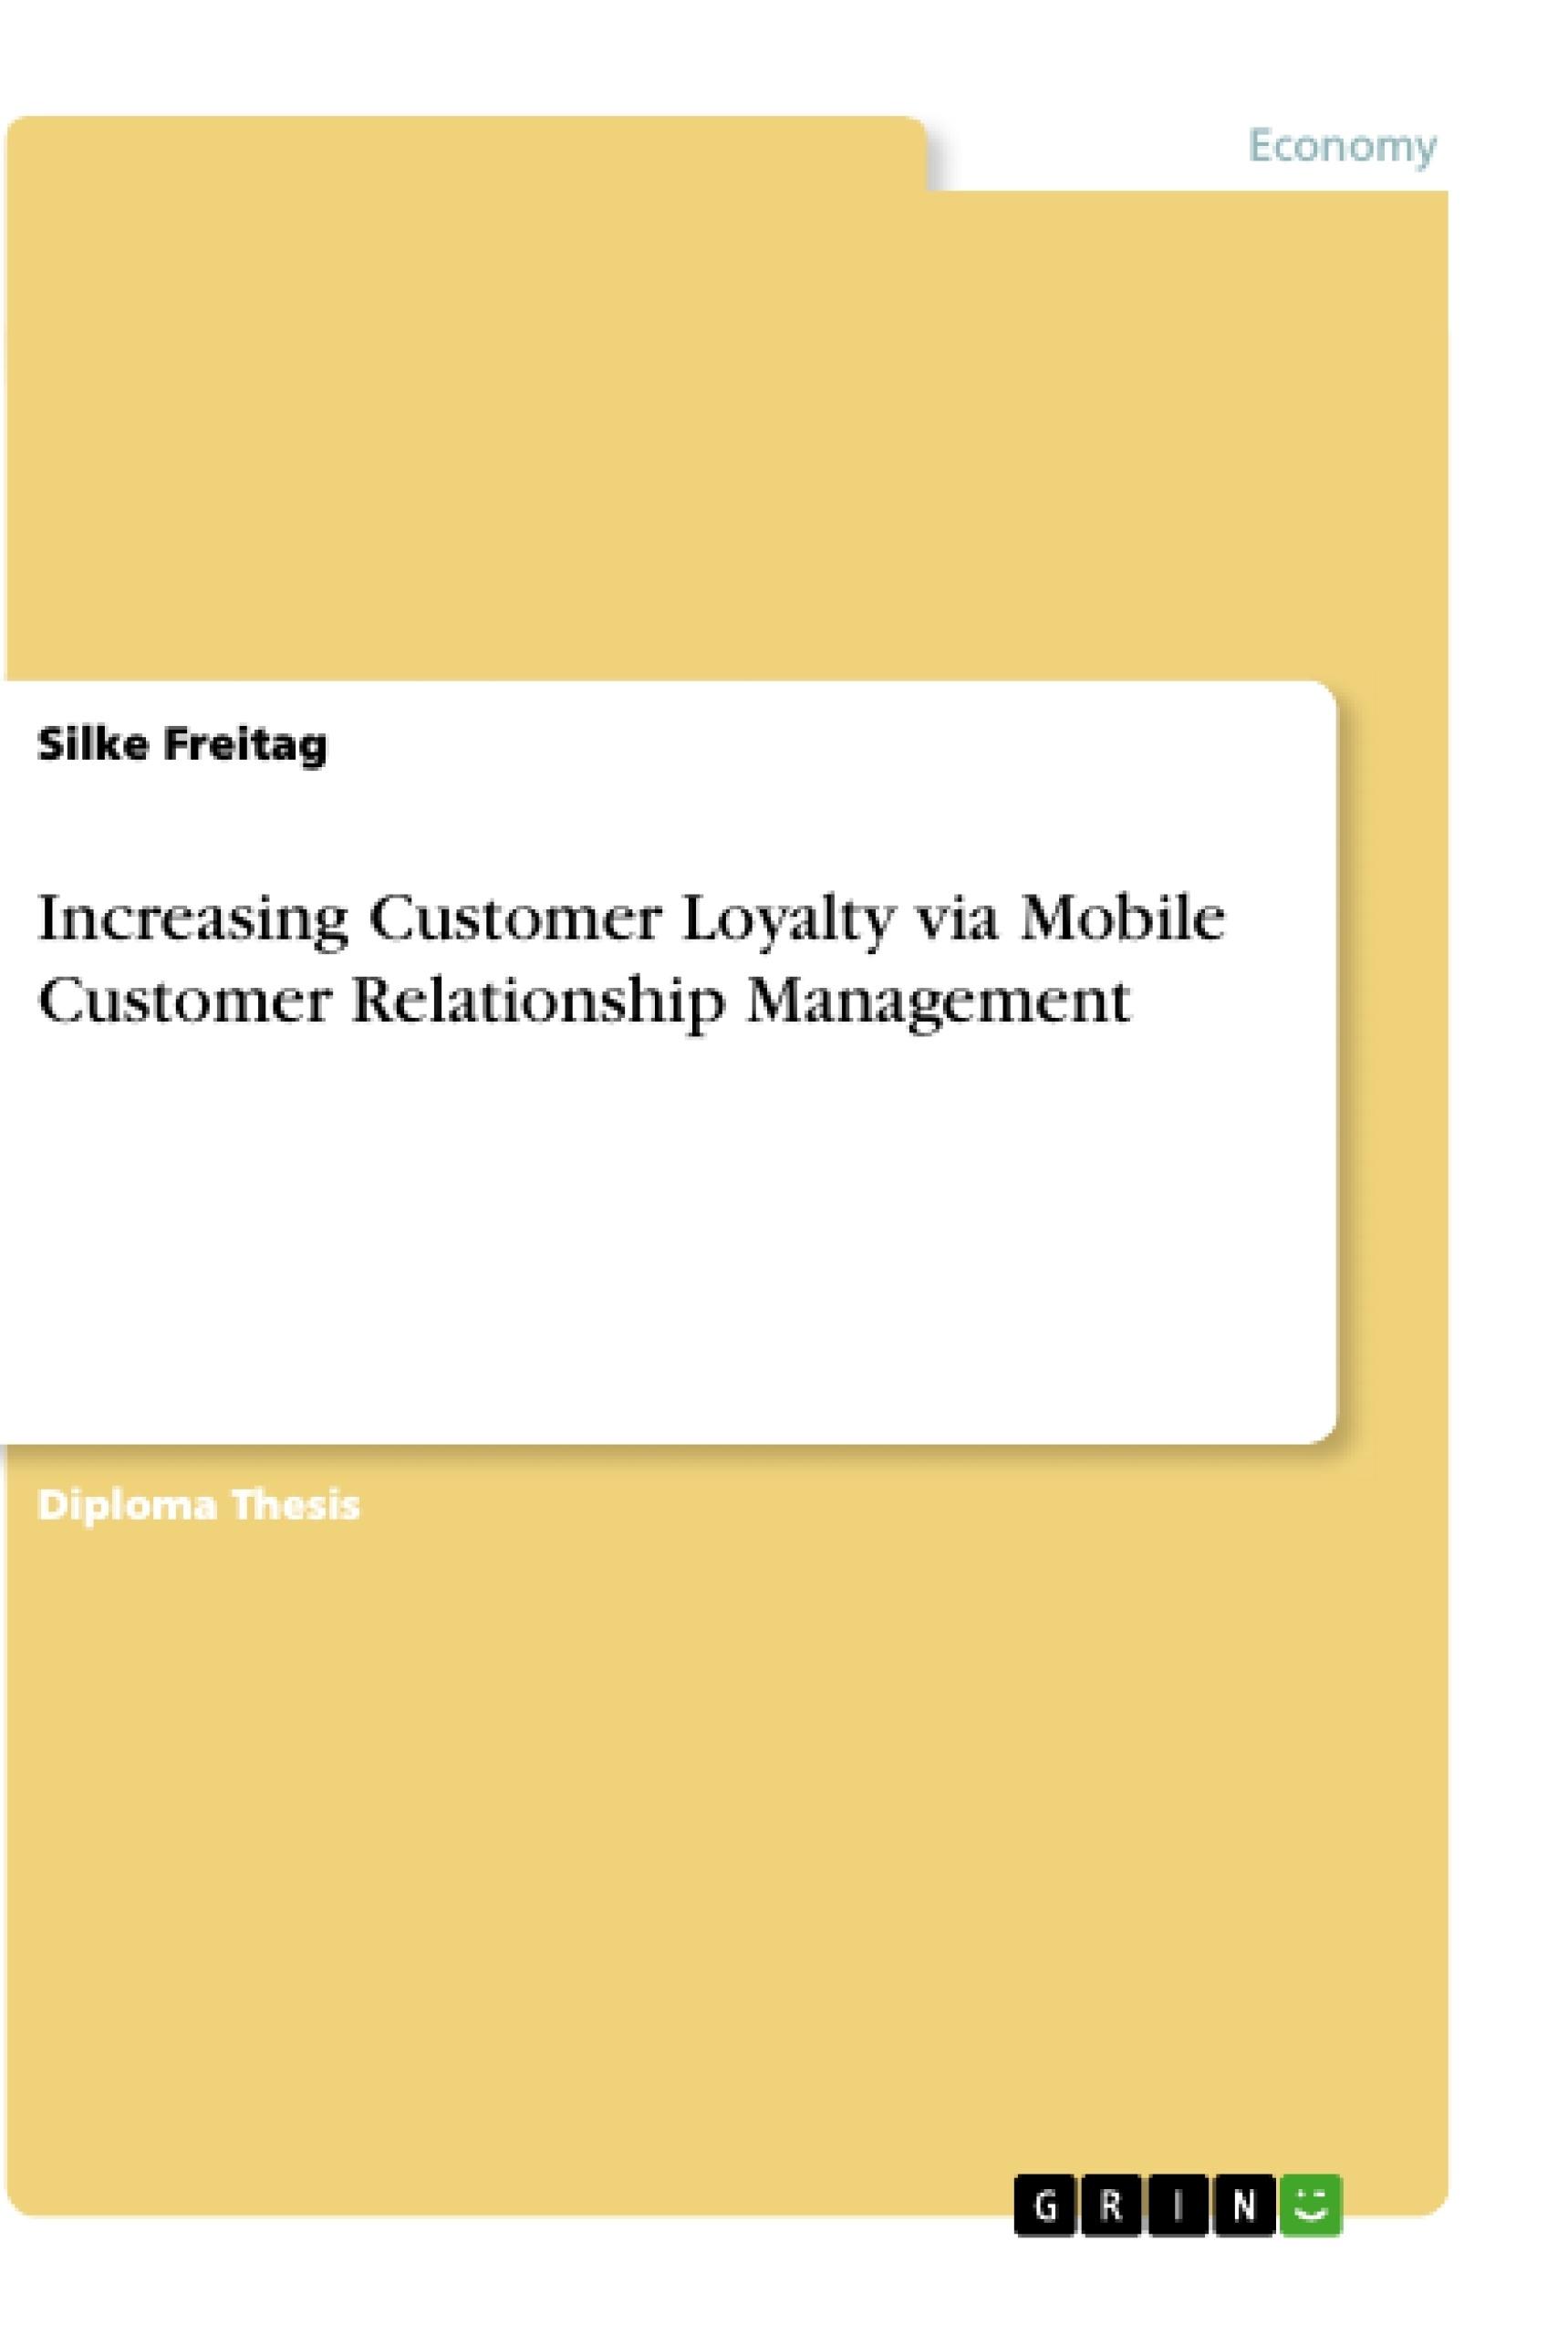 Title: Increasing Customer Loyalty via Mobile Customer Relationship Management